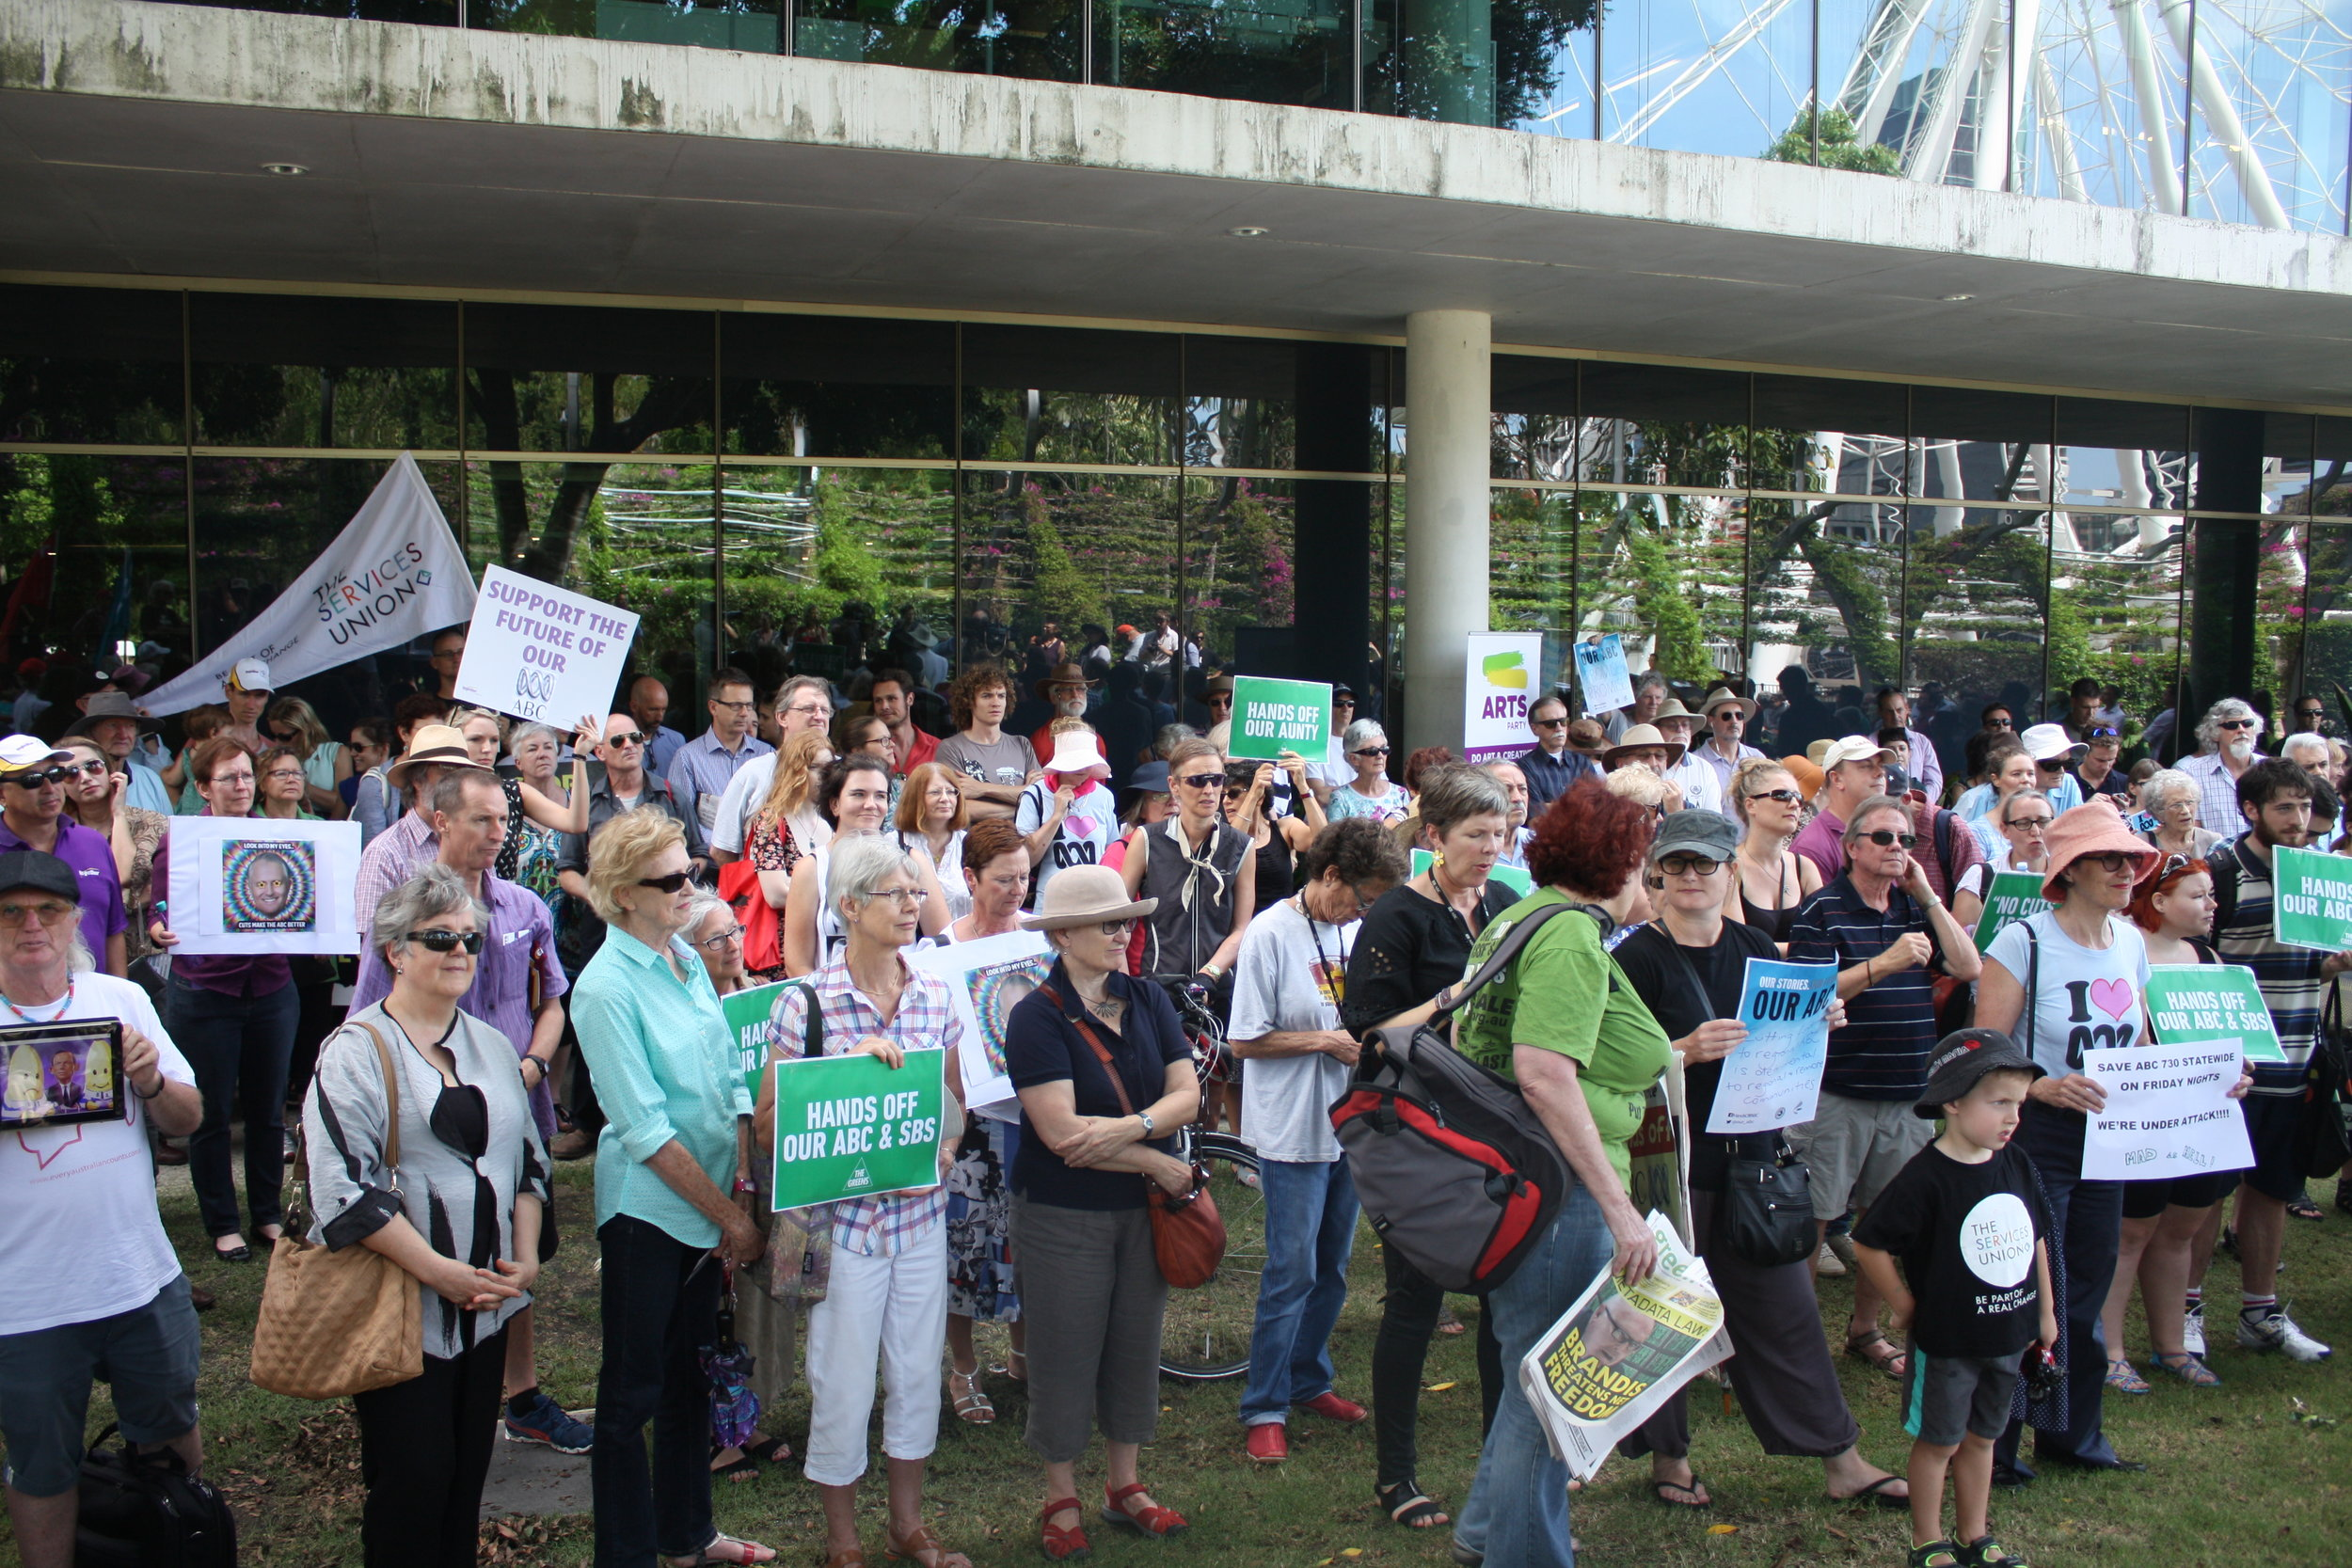 Lesly Lotha_Newzulu Australia_ABC cuts protest_Brisbane 03